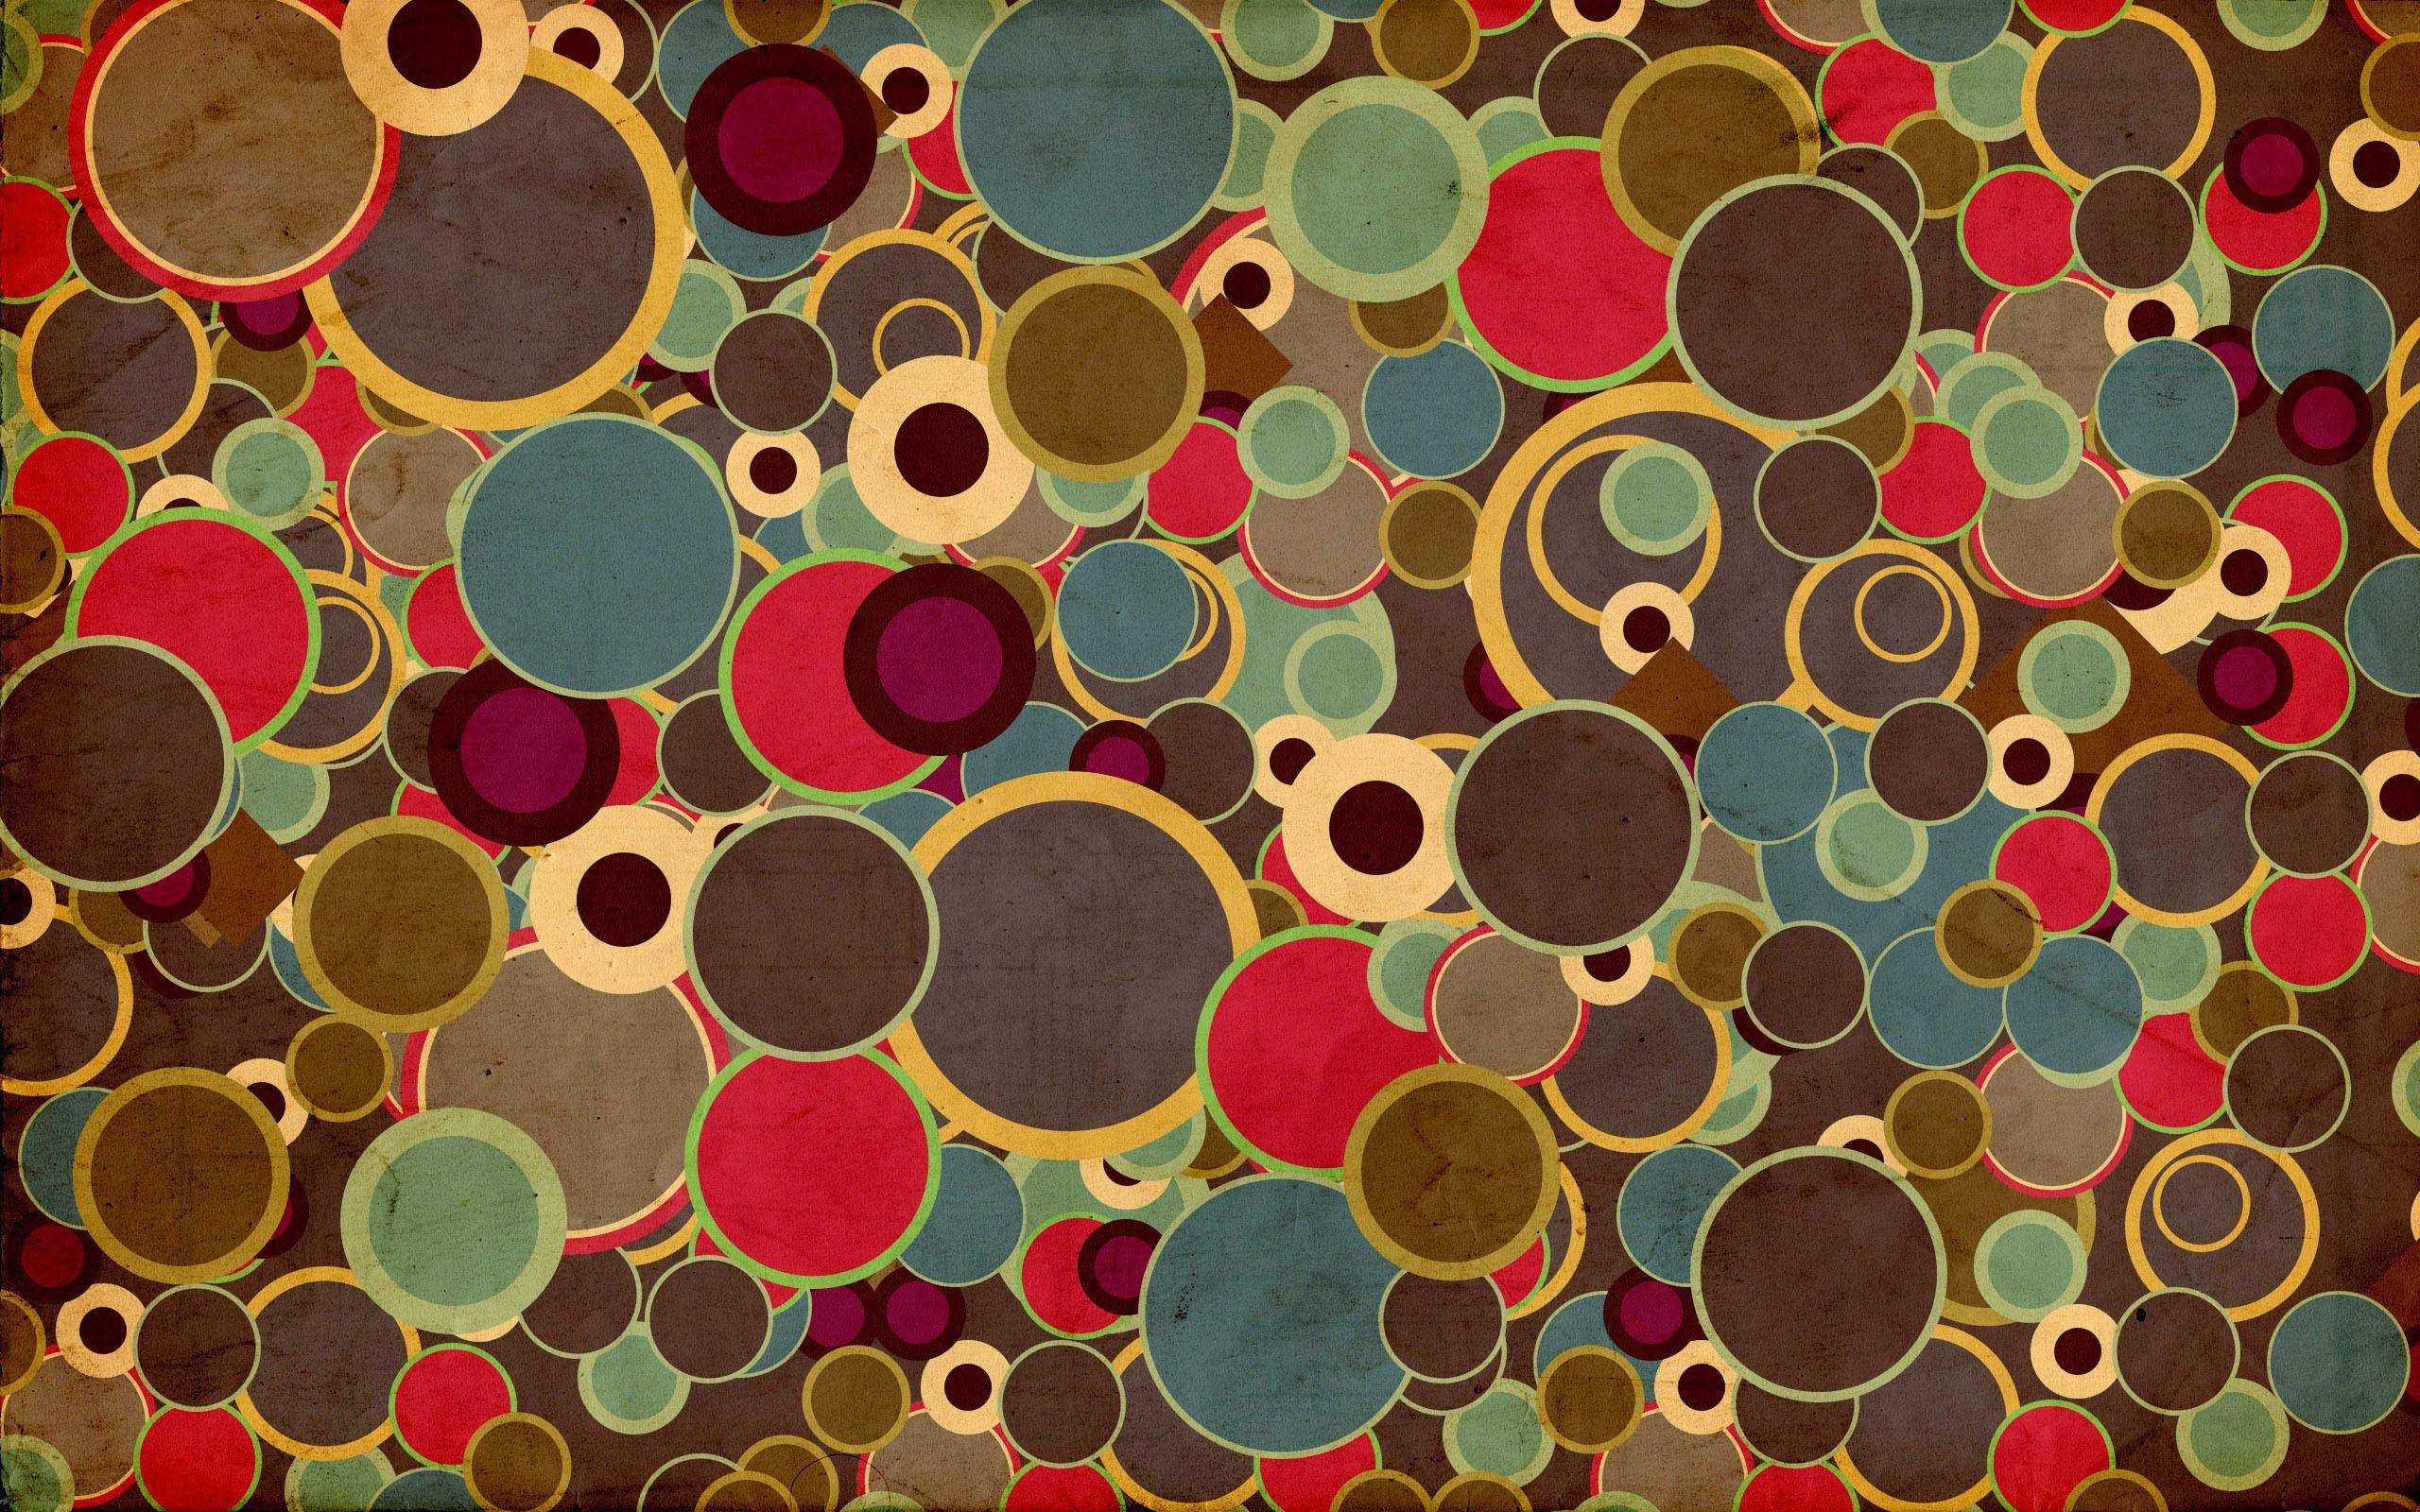 awesome circle wallpaper | feelgrafix | pinterest | wallpaper